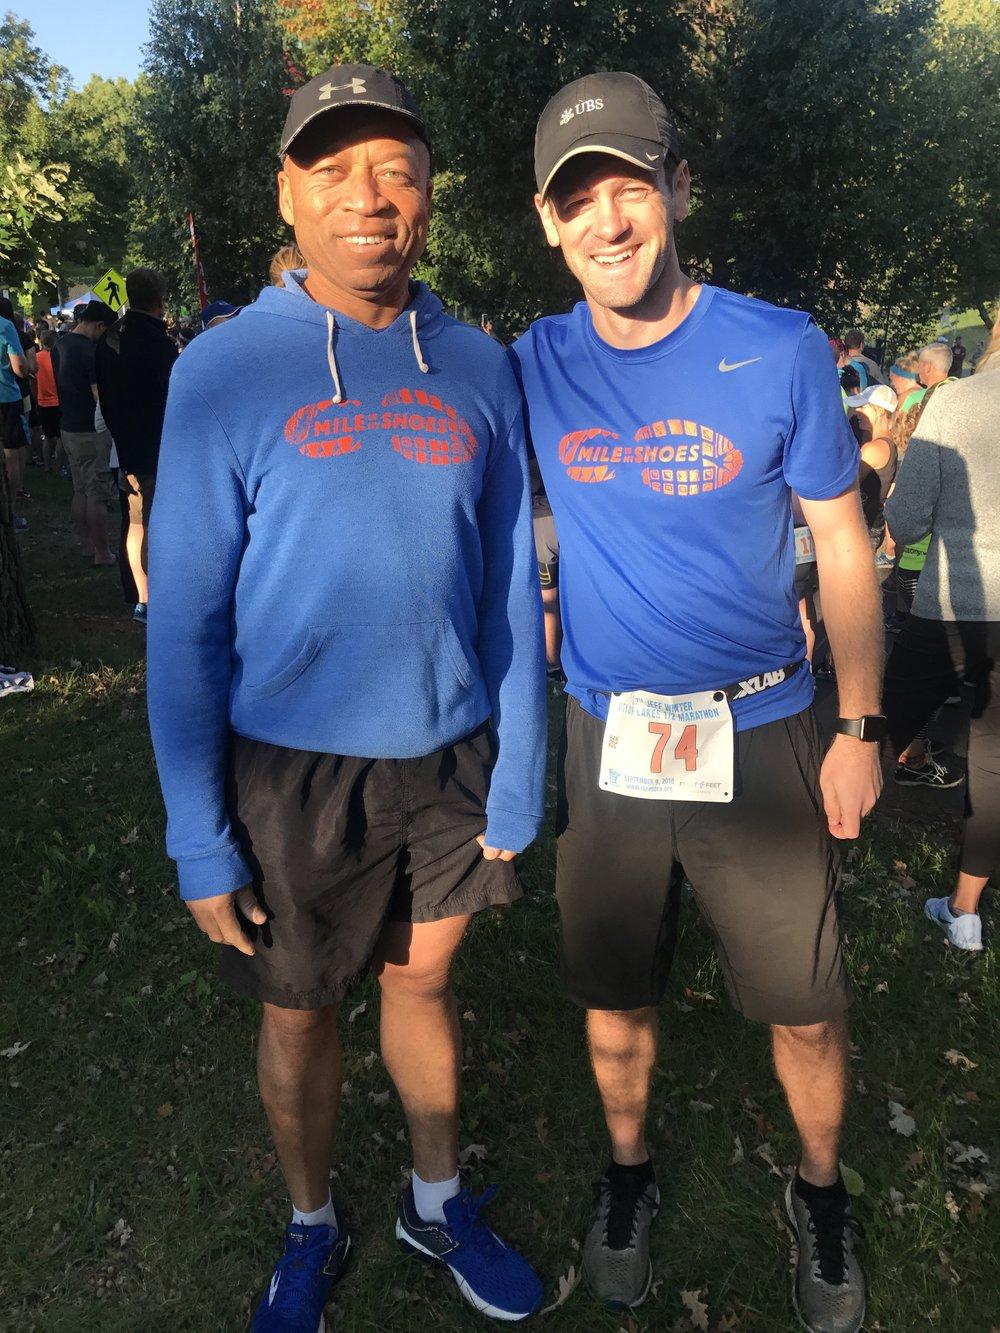 Peter (left), Team Higher Ground Minneapolis